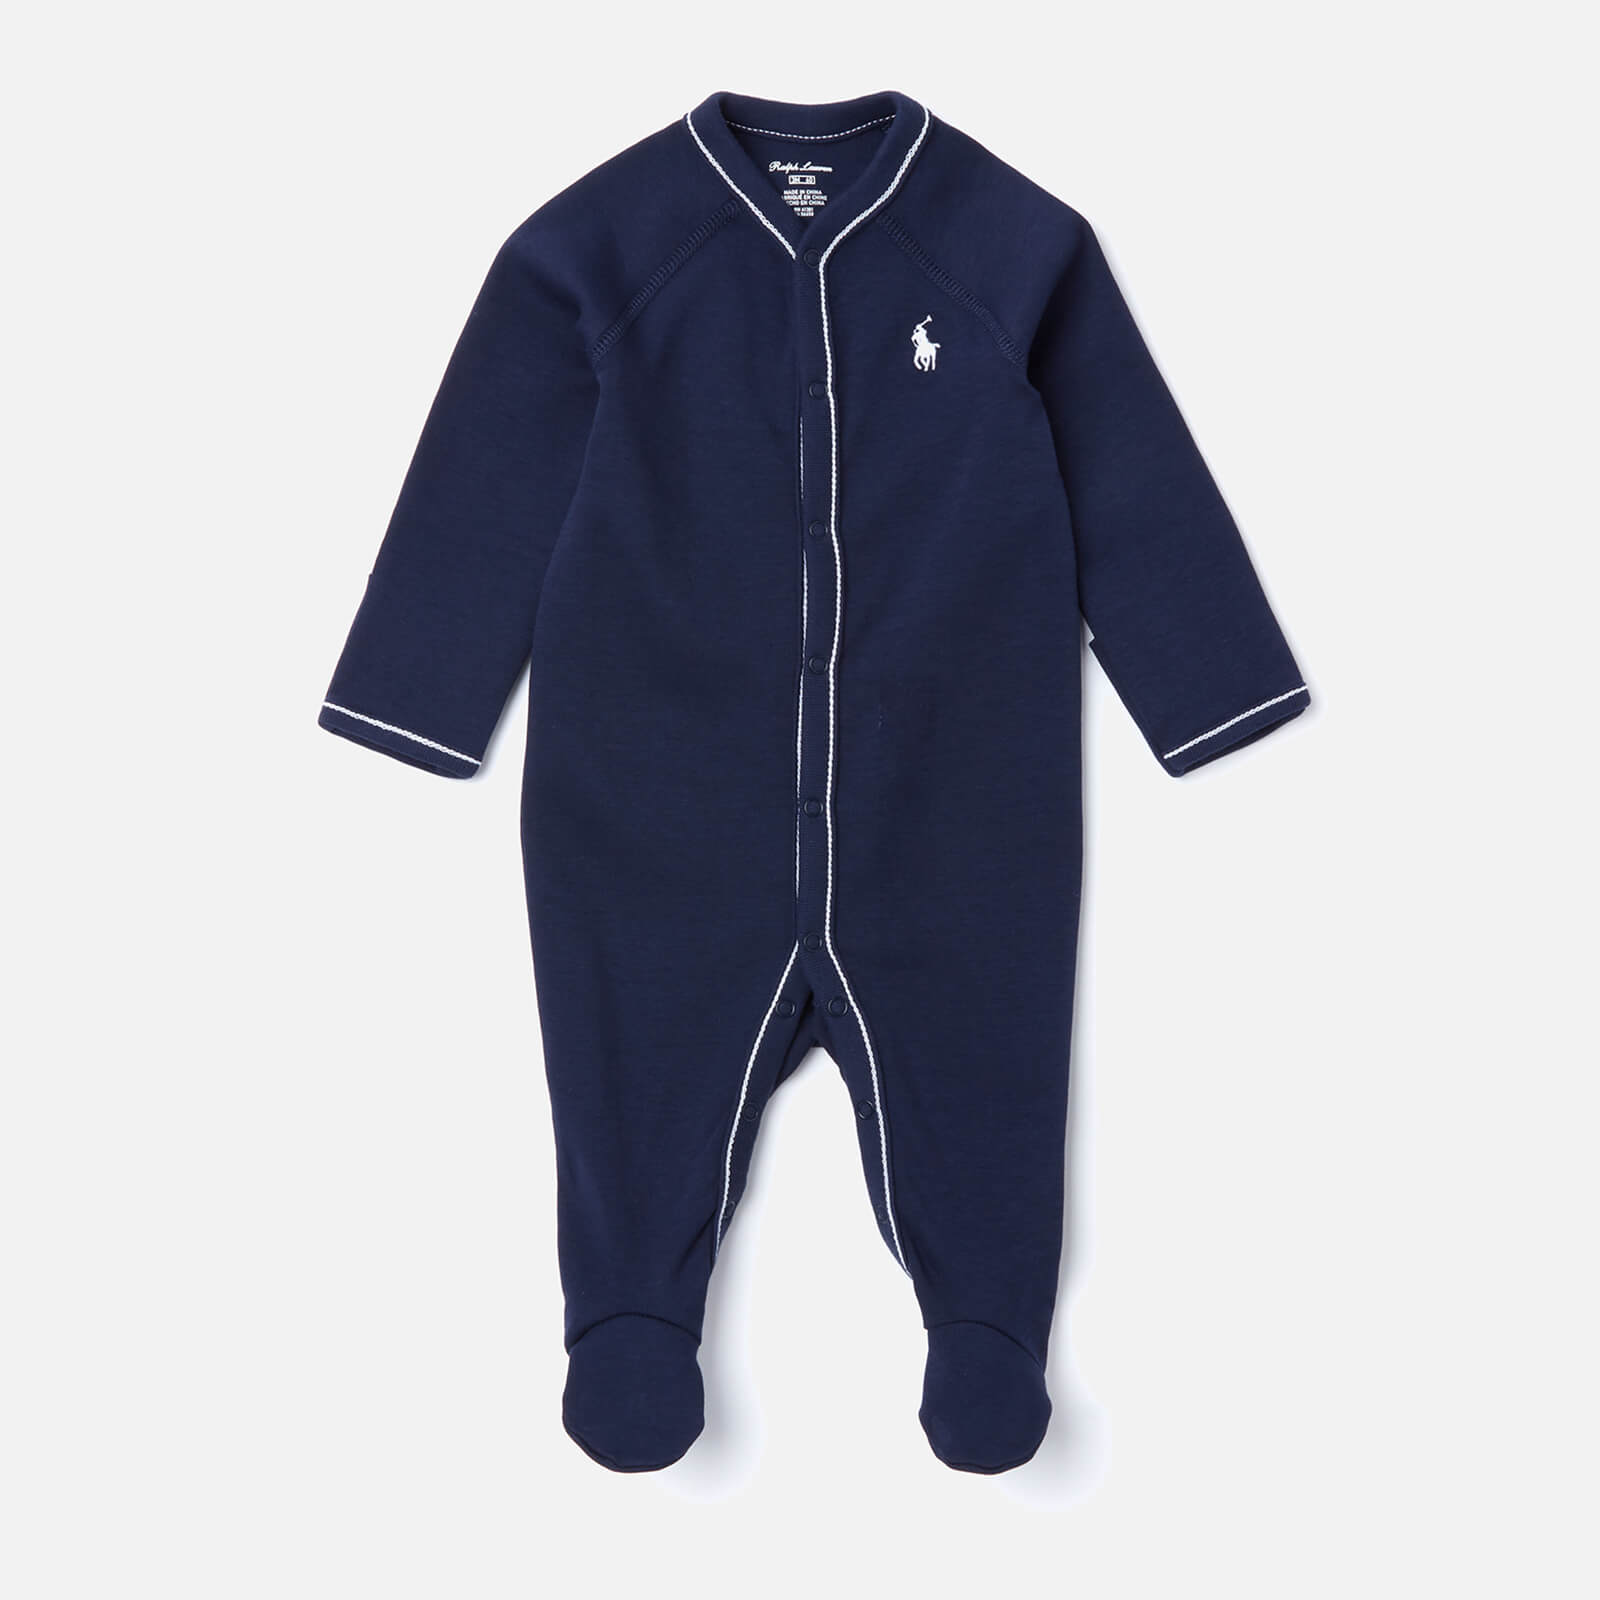 Polo Ralph Lauren Boys' Logo Sleep Suit - Navy - 6 Months